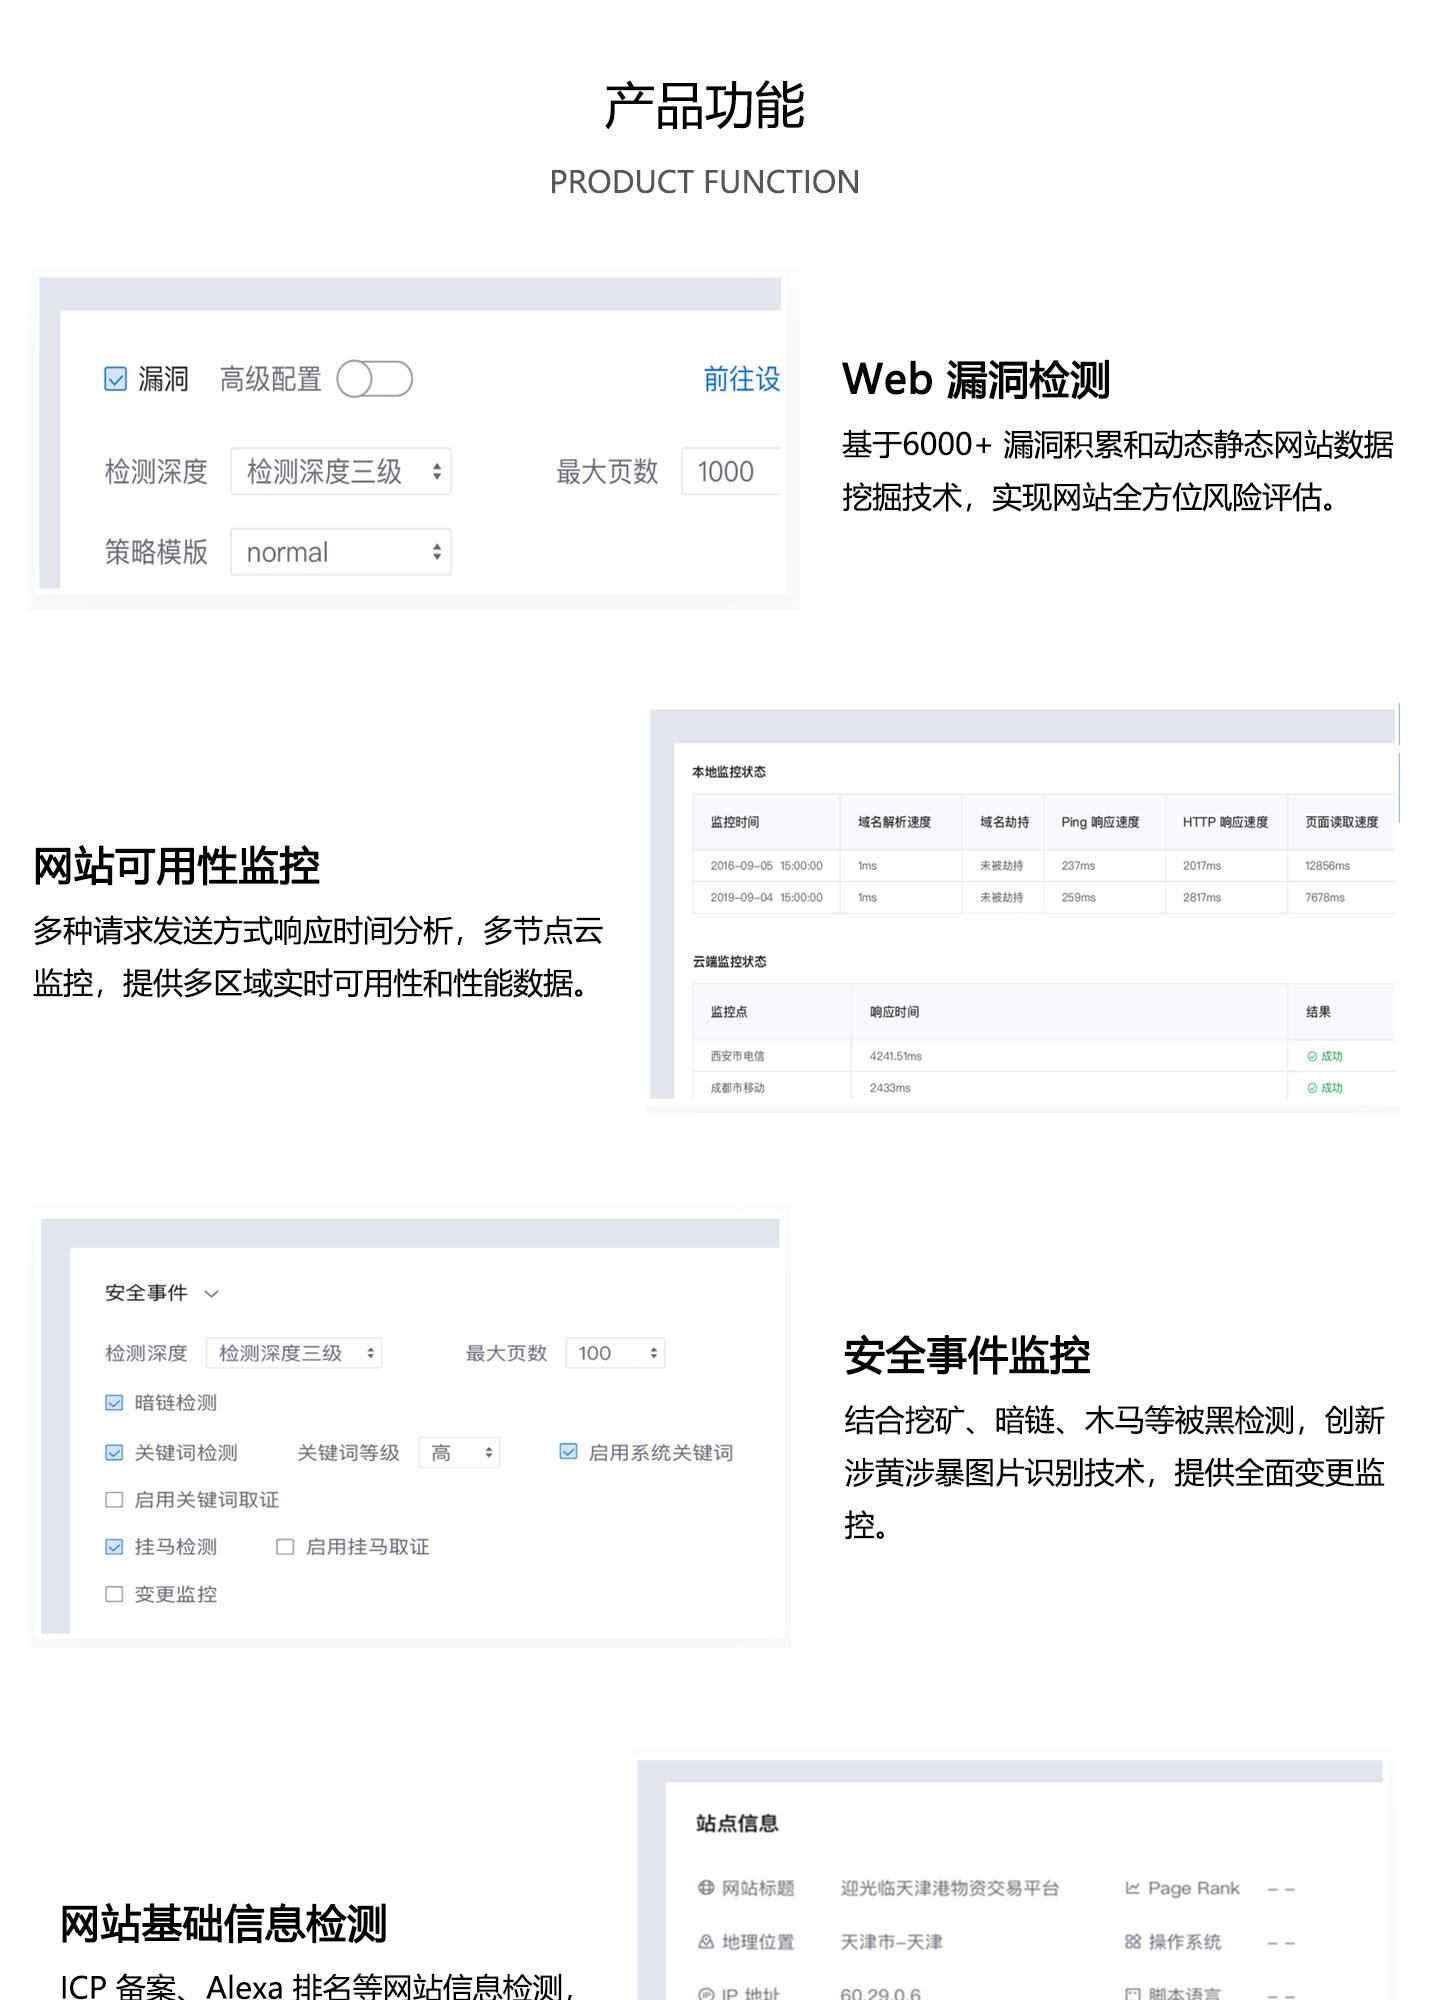 WebSOC-网站立体监控系统1440_02.jpg